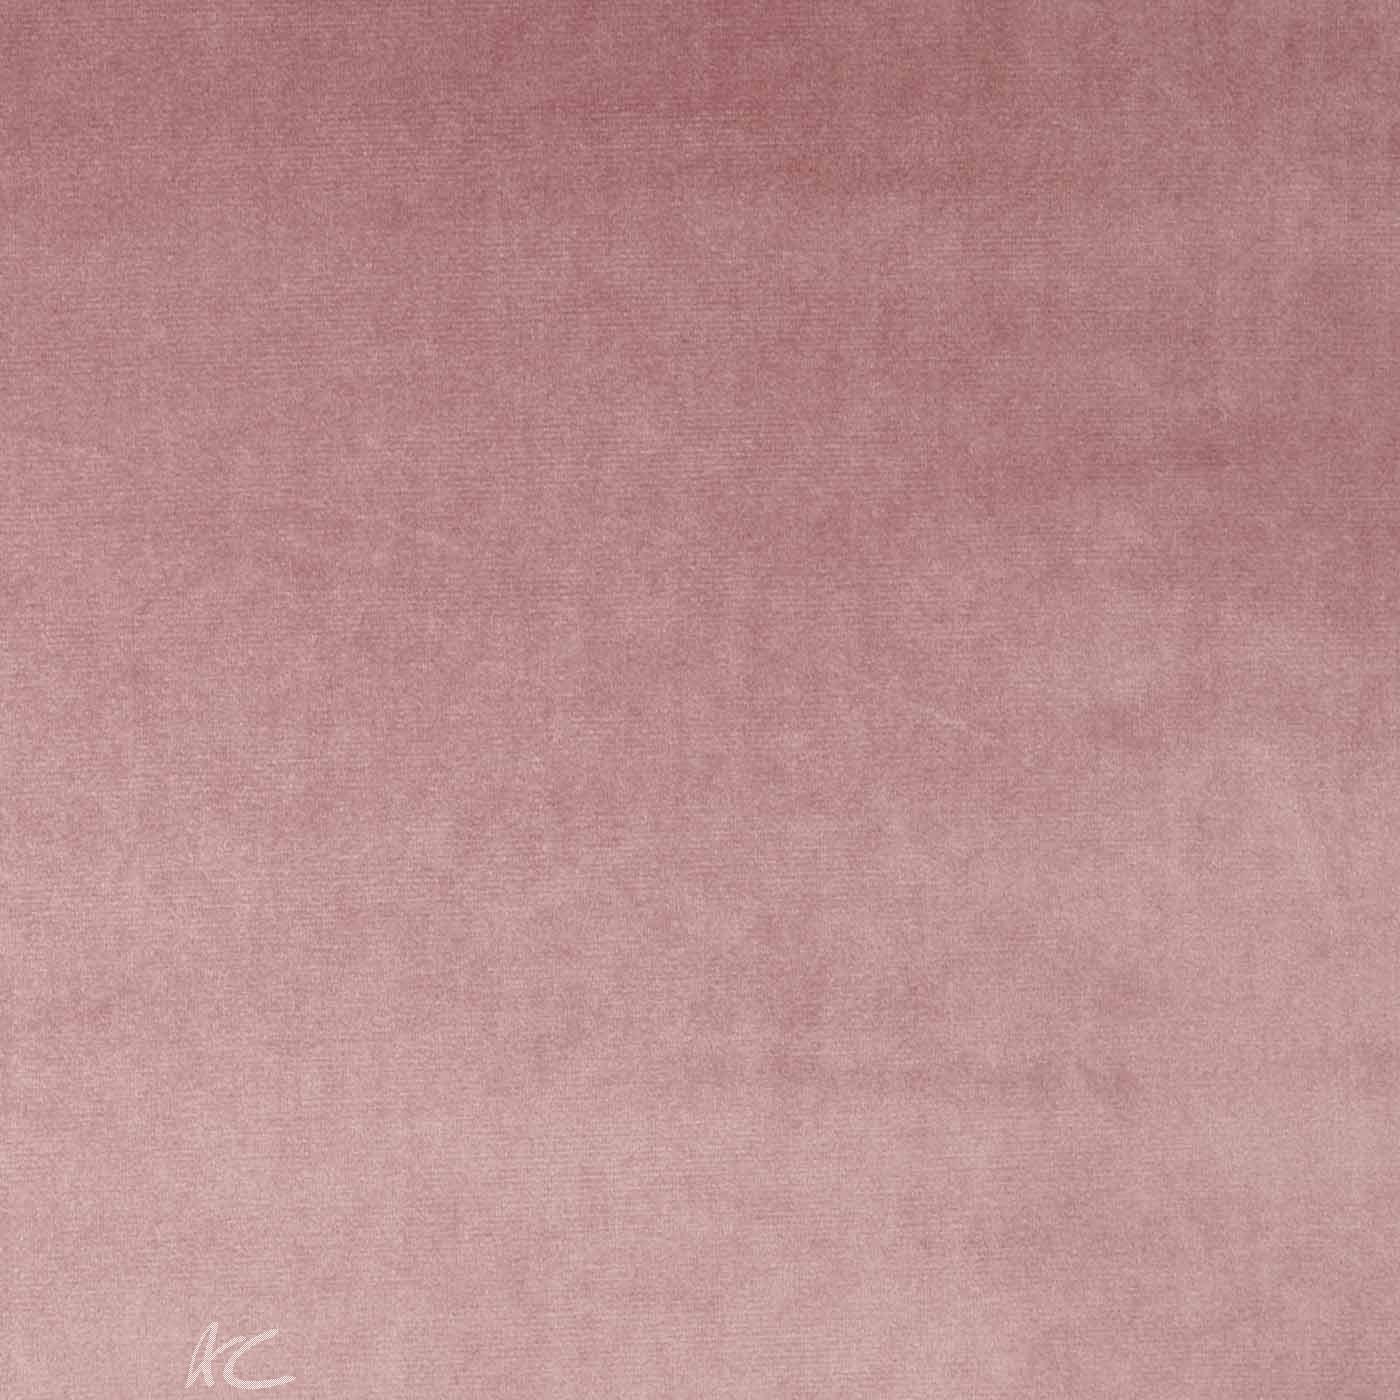 Velour Velour Petal Cushion Covers